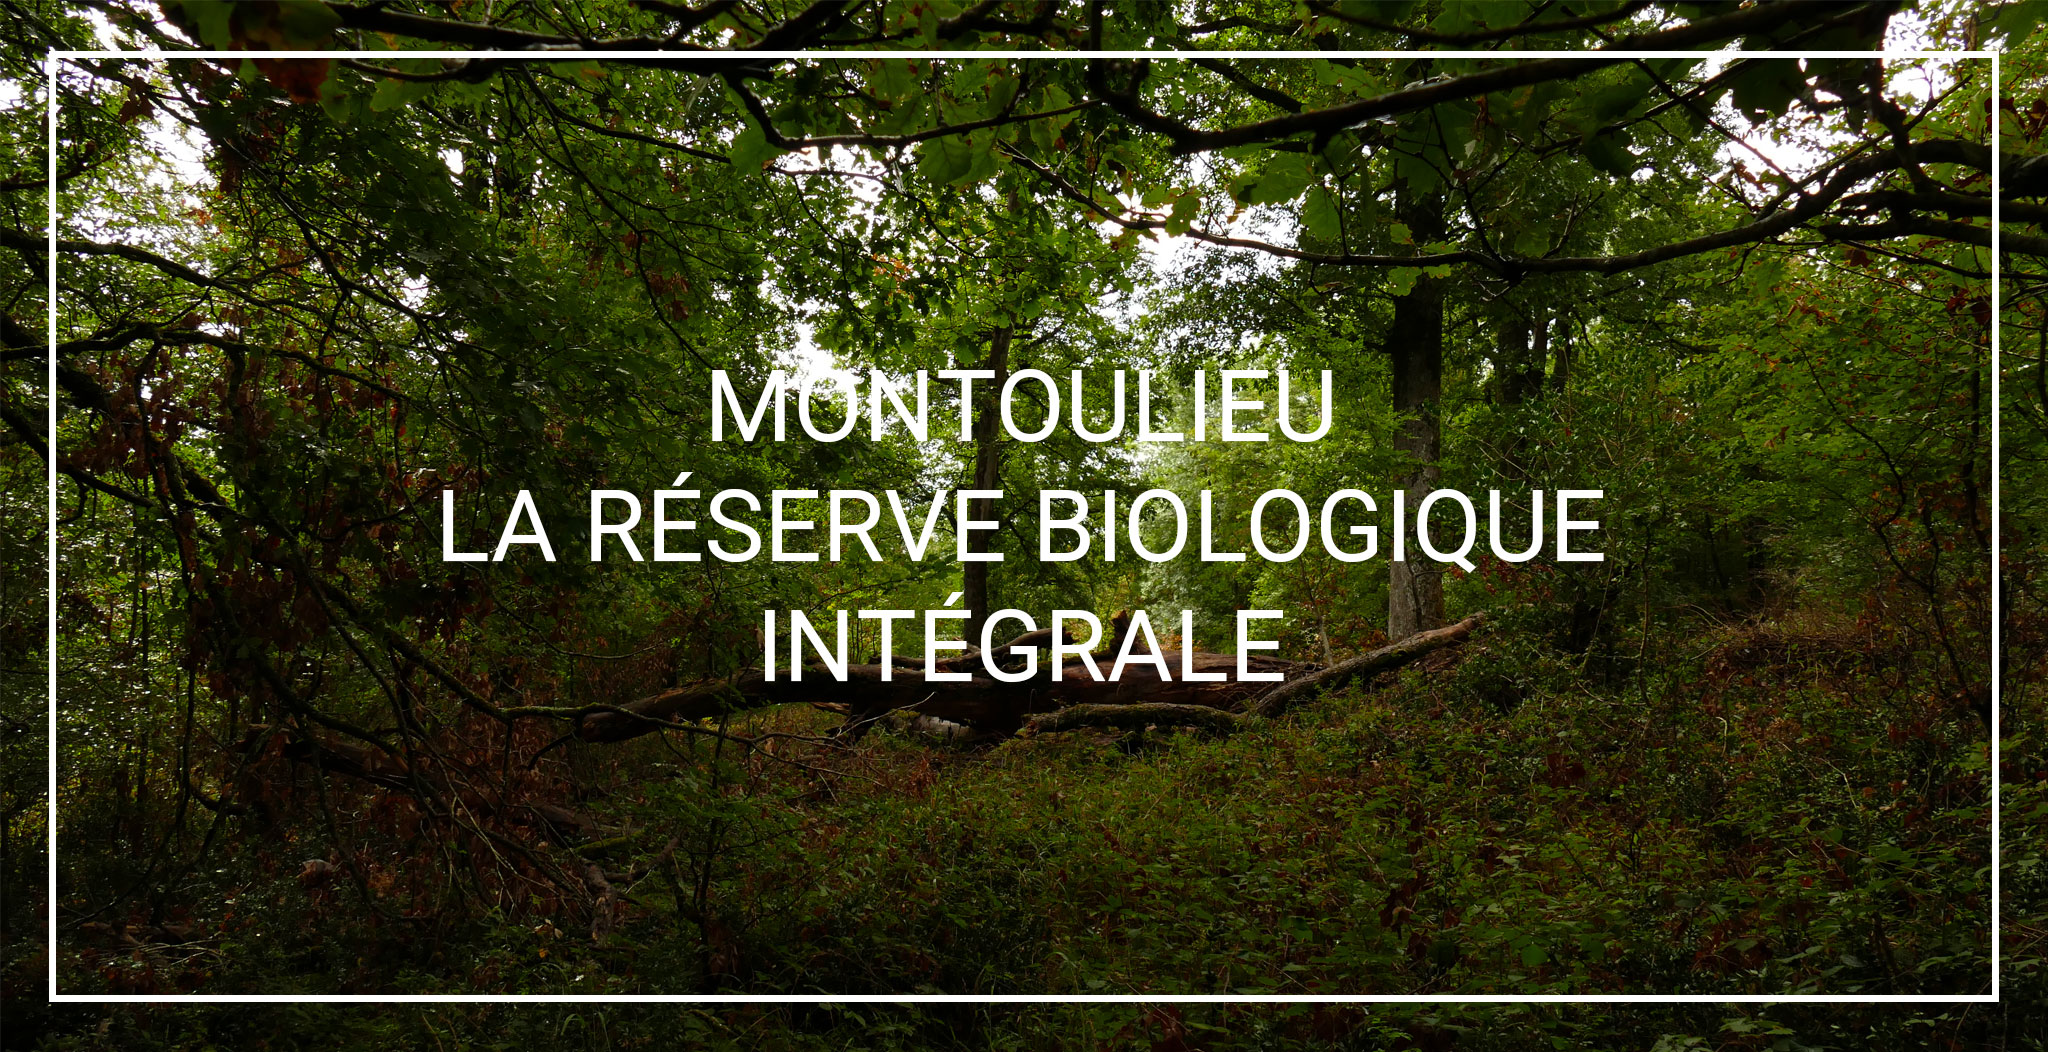 Galerie photo SN1_Montouliieu_la_reserve_biologique_intégrale